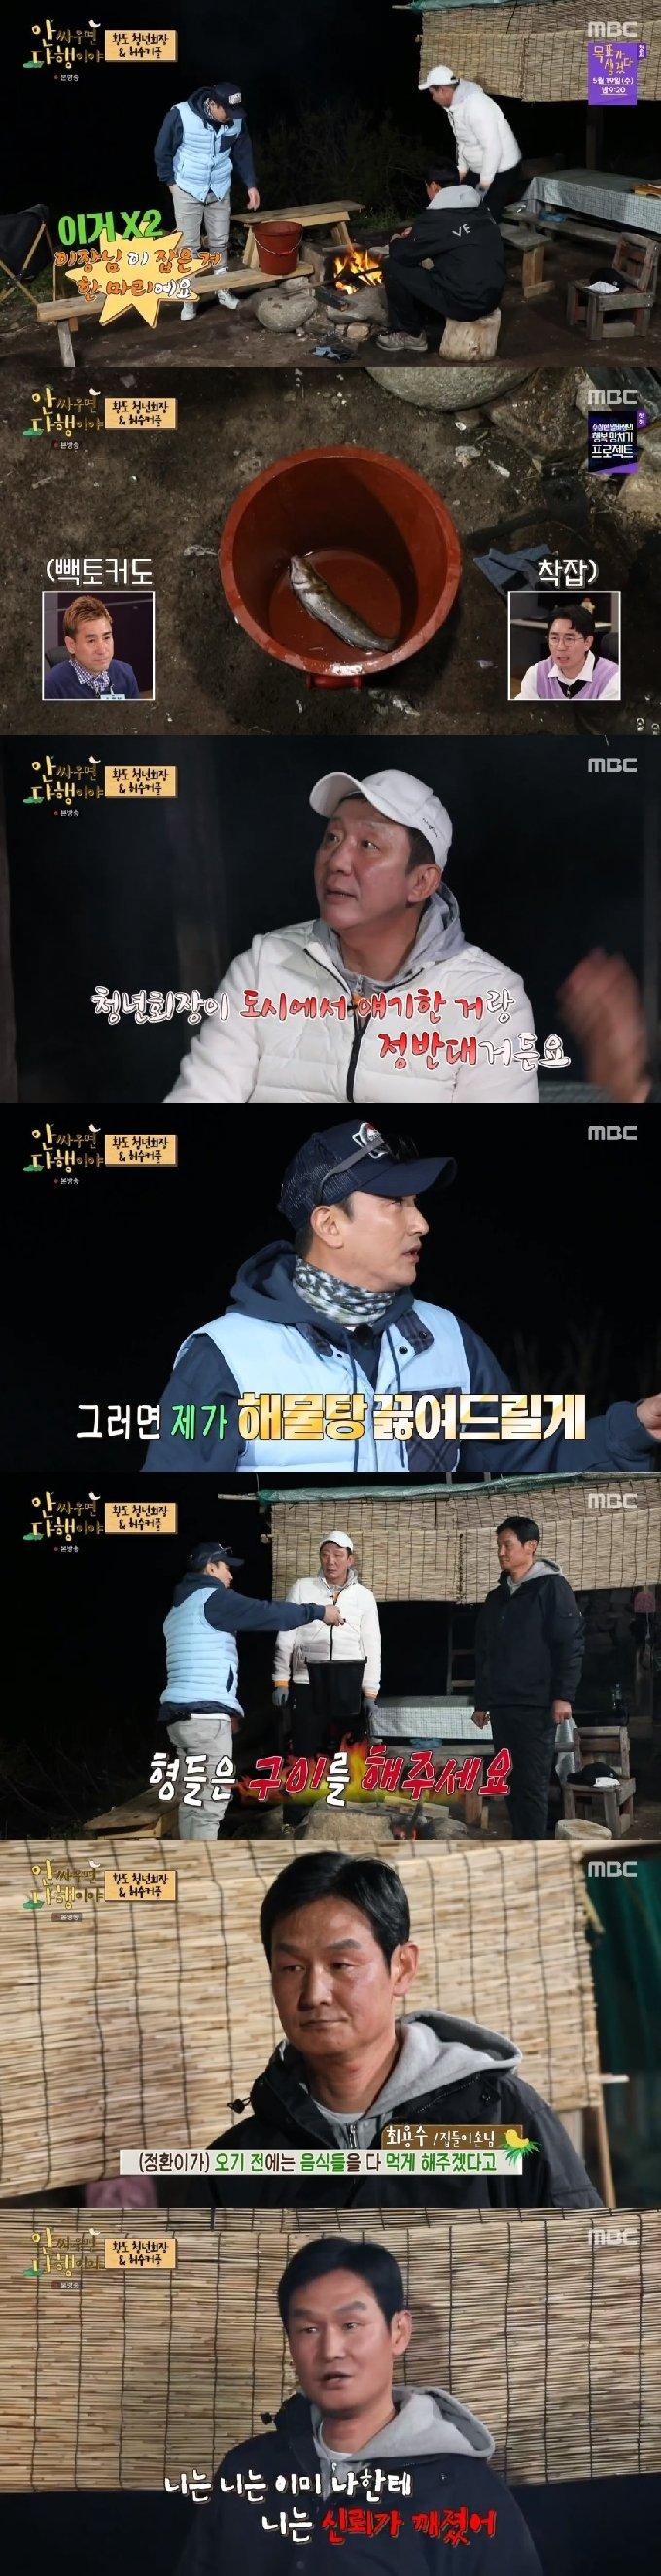 MBC '안싸우면 다행이야' 캡처 © 뉴스1